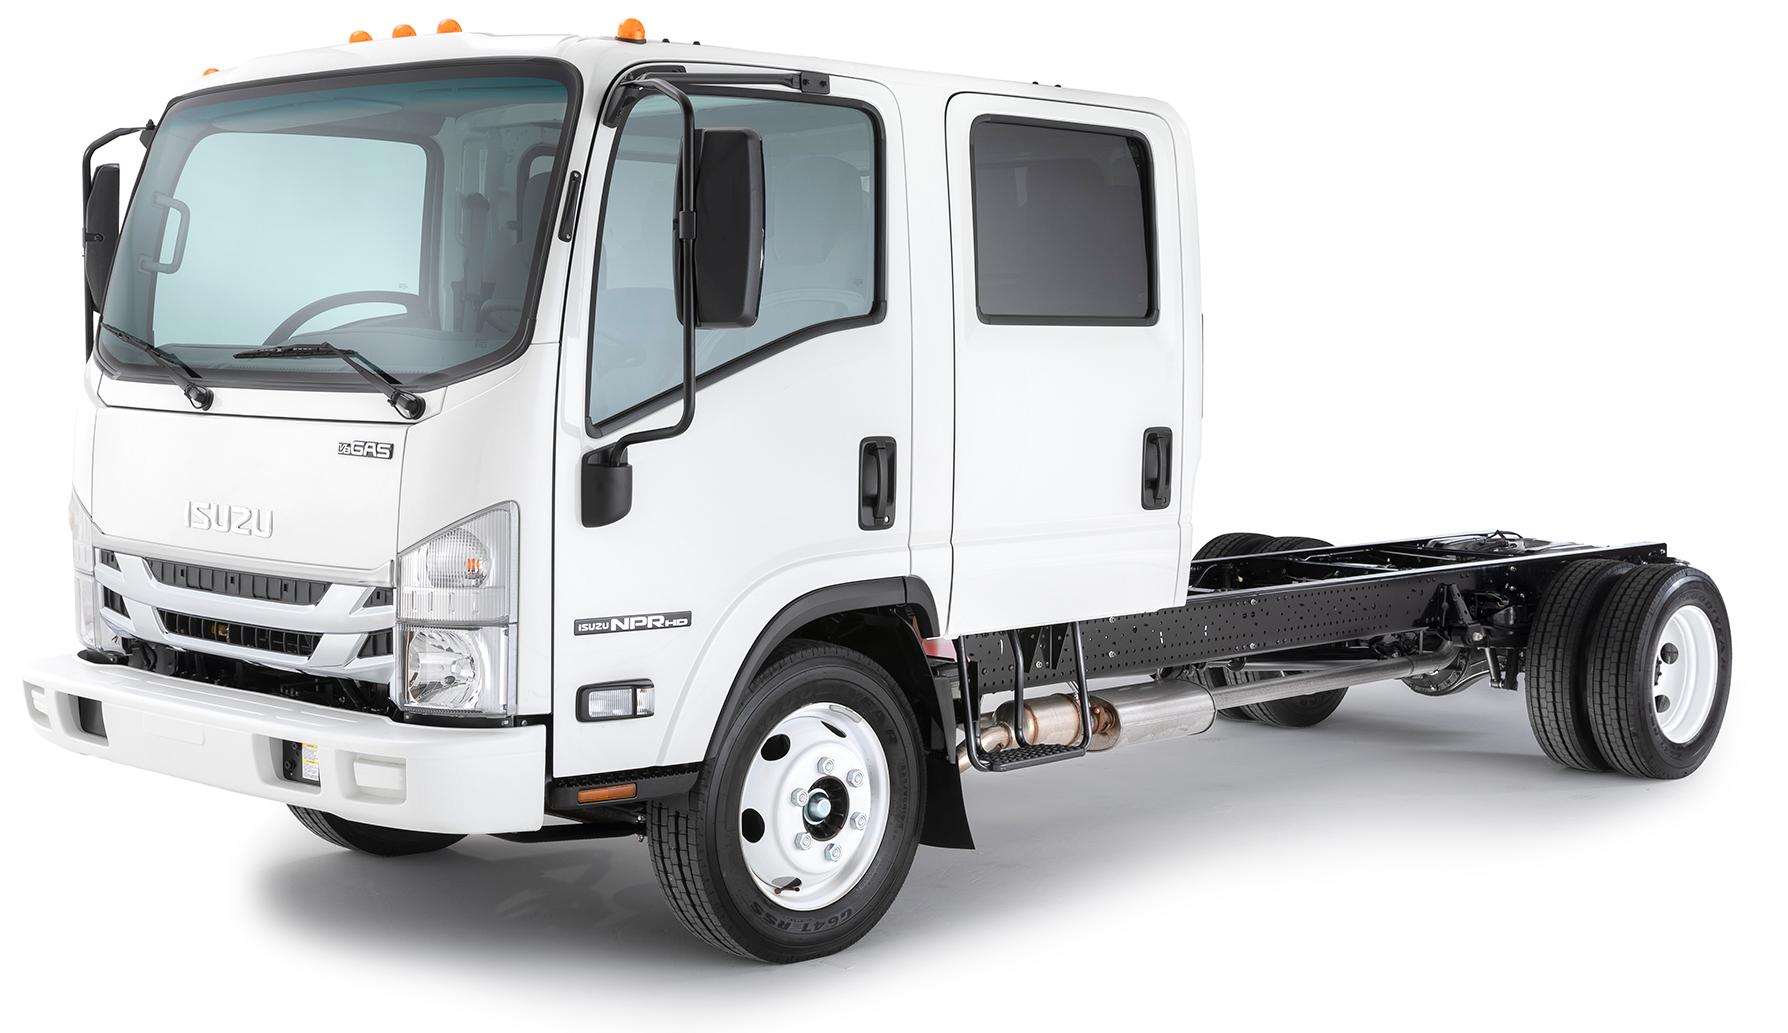 NPR-HD (Gas) Double Cab Truck